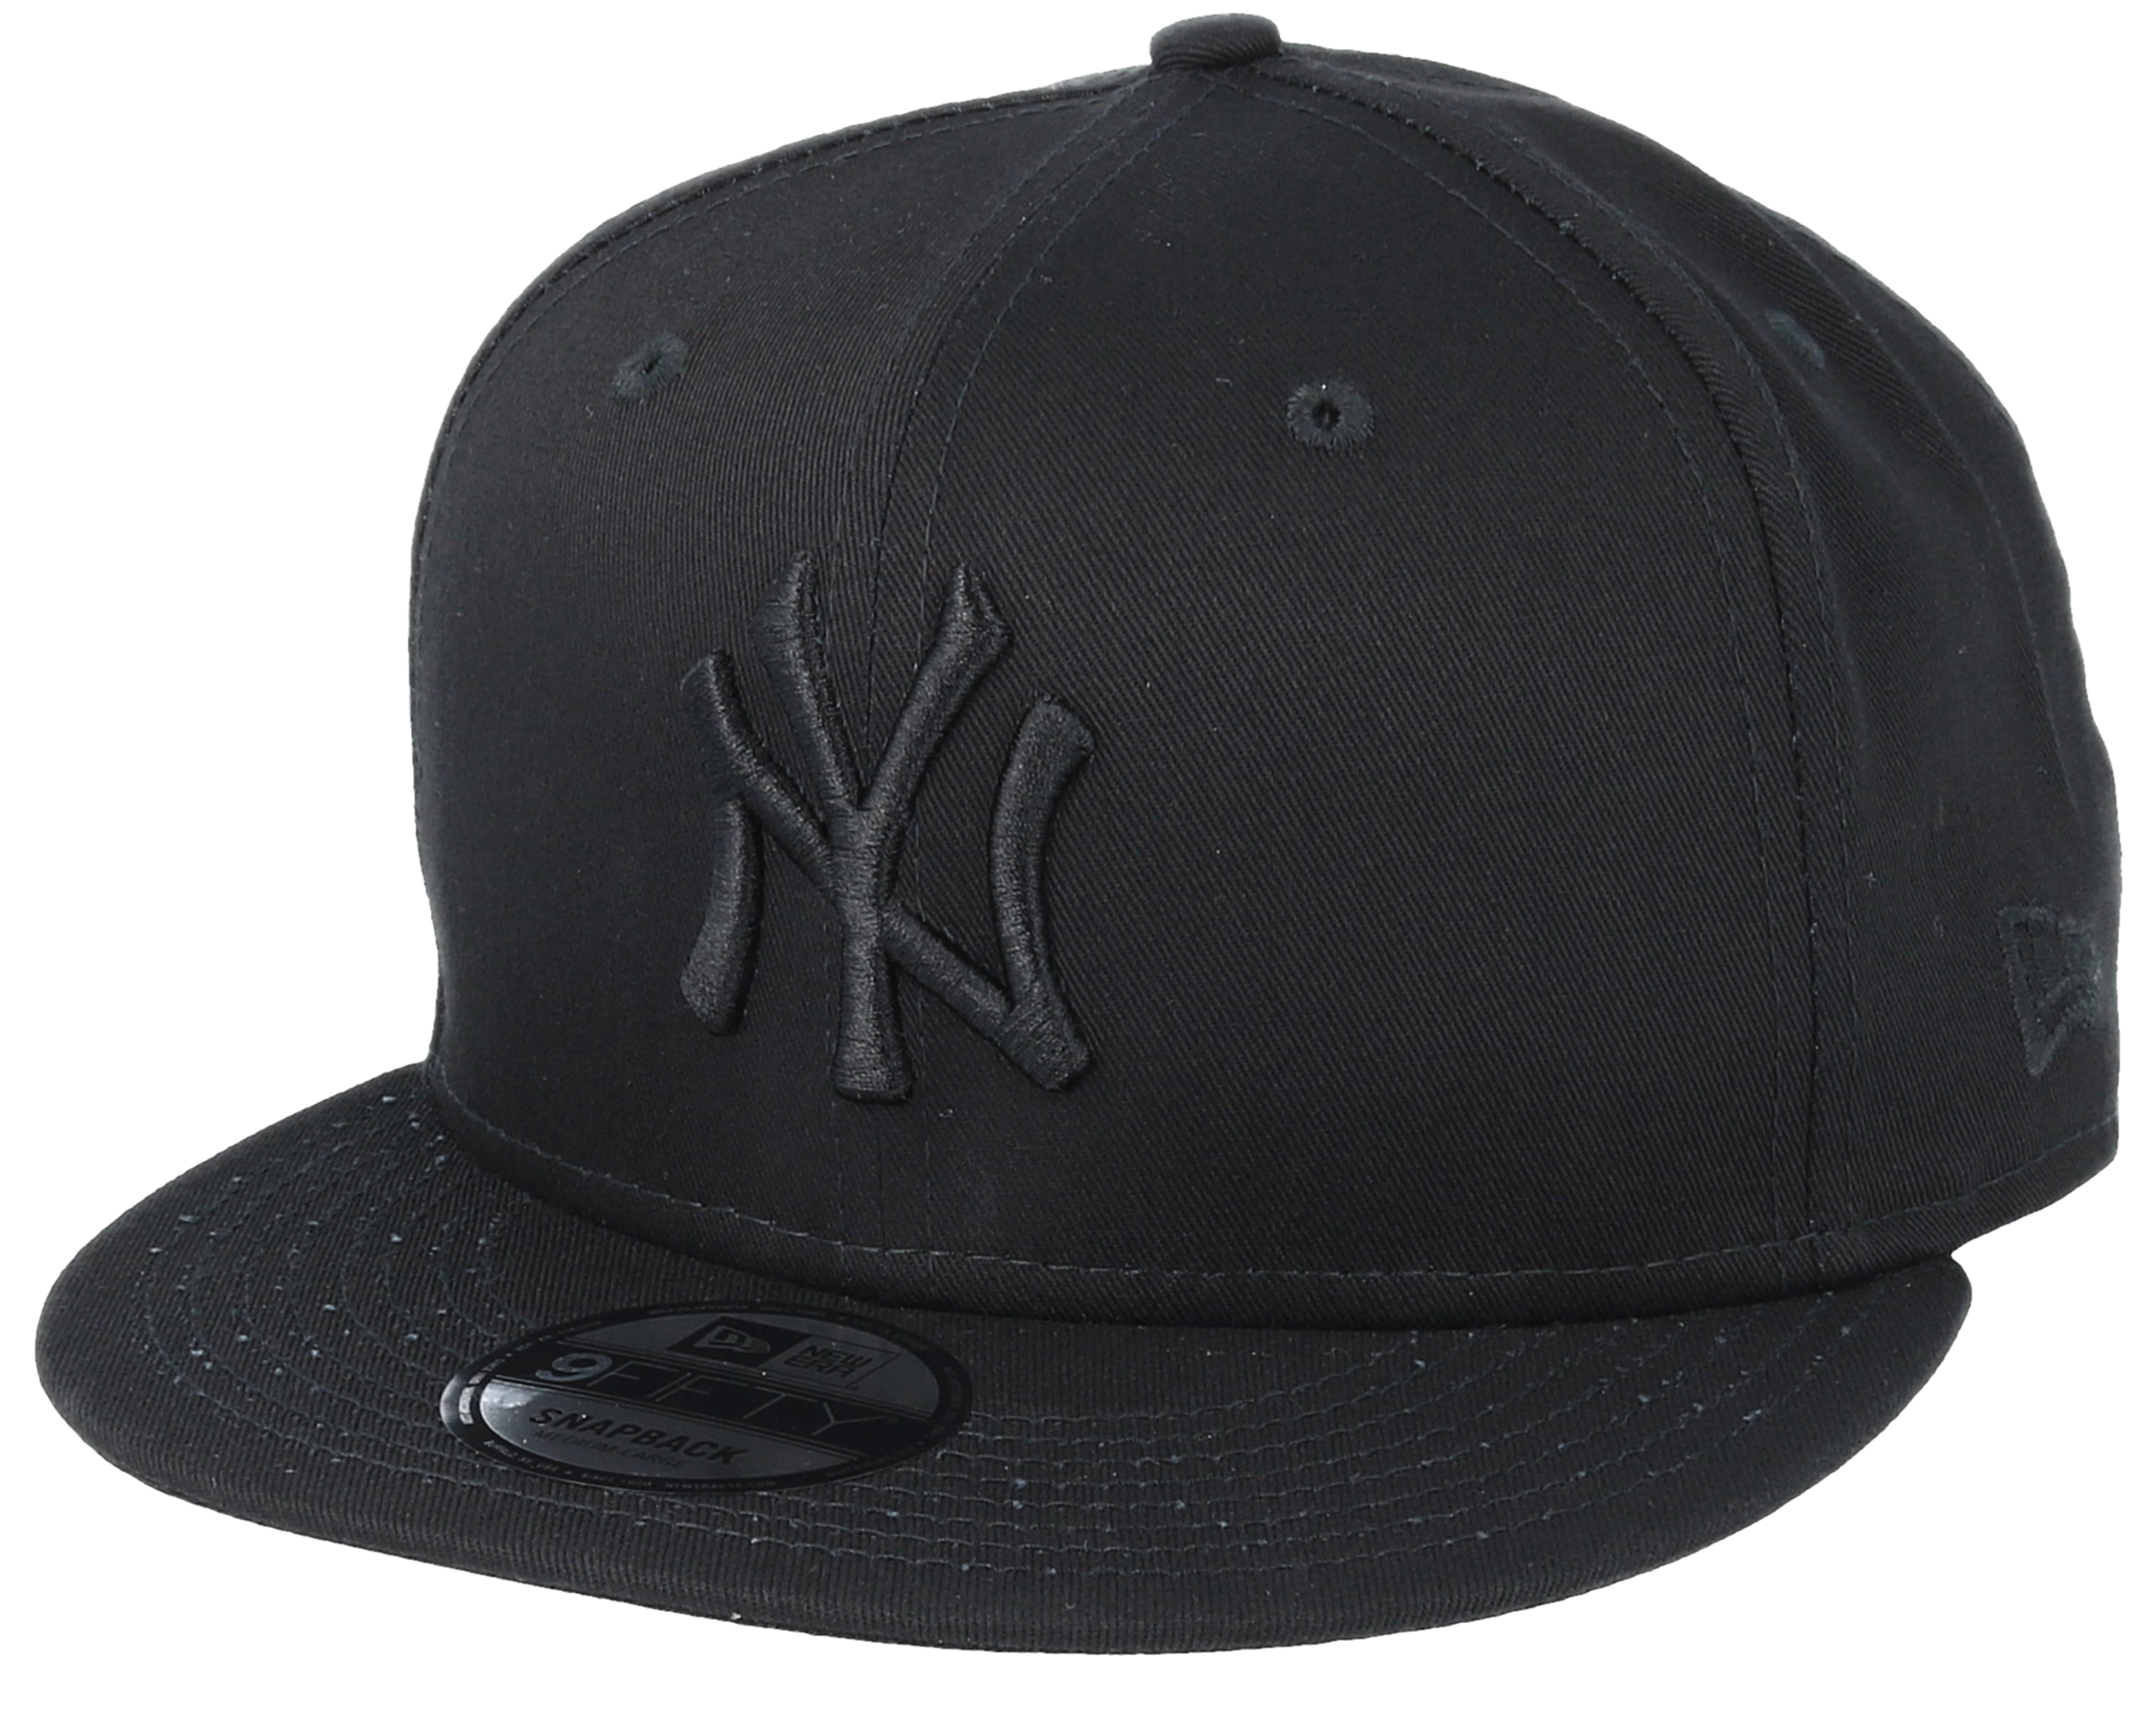 ny yankees black black 9fifty snapback new era cap. Black Bedroom Furniture Sets. Home Design Ideas